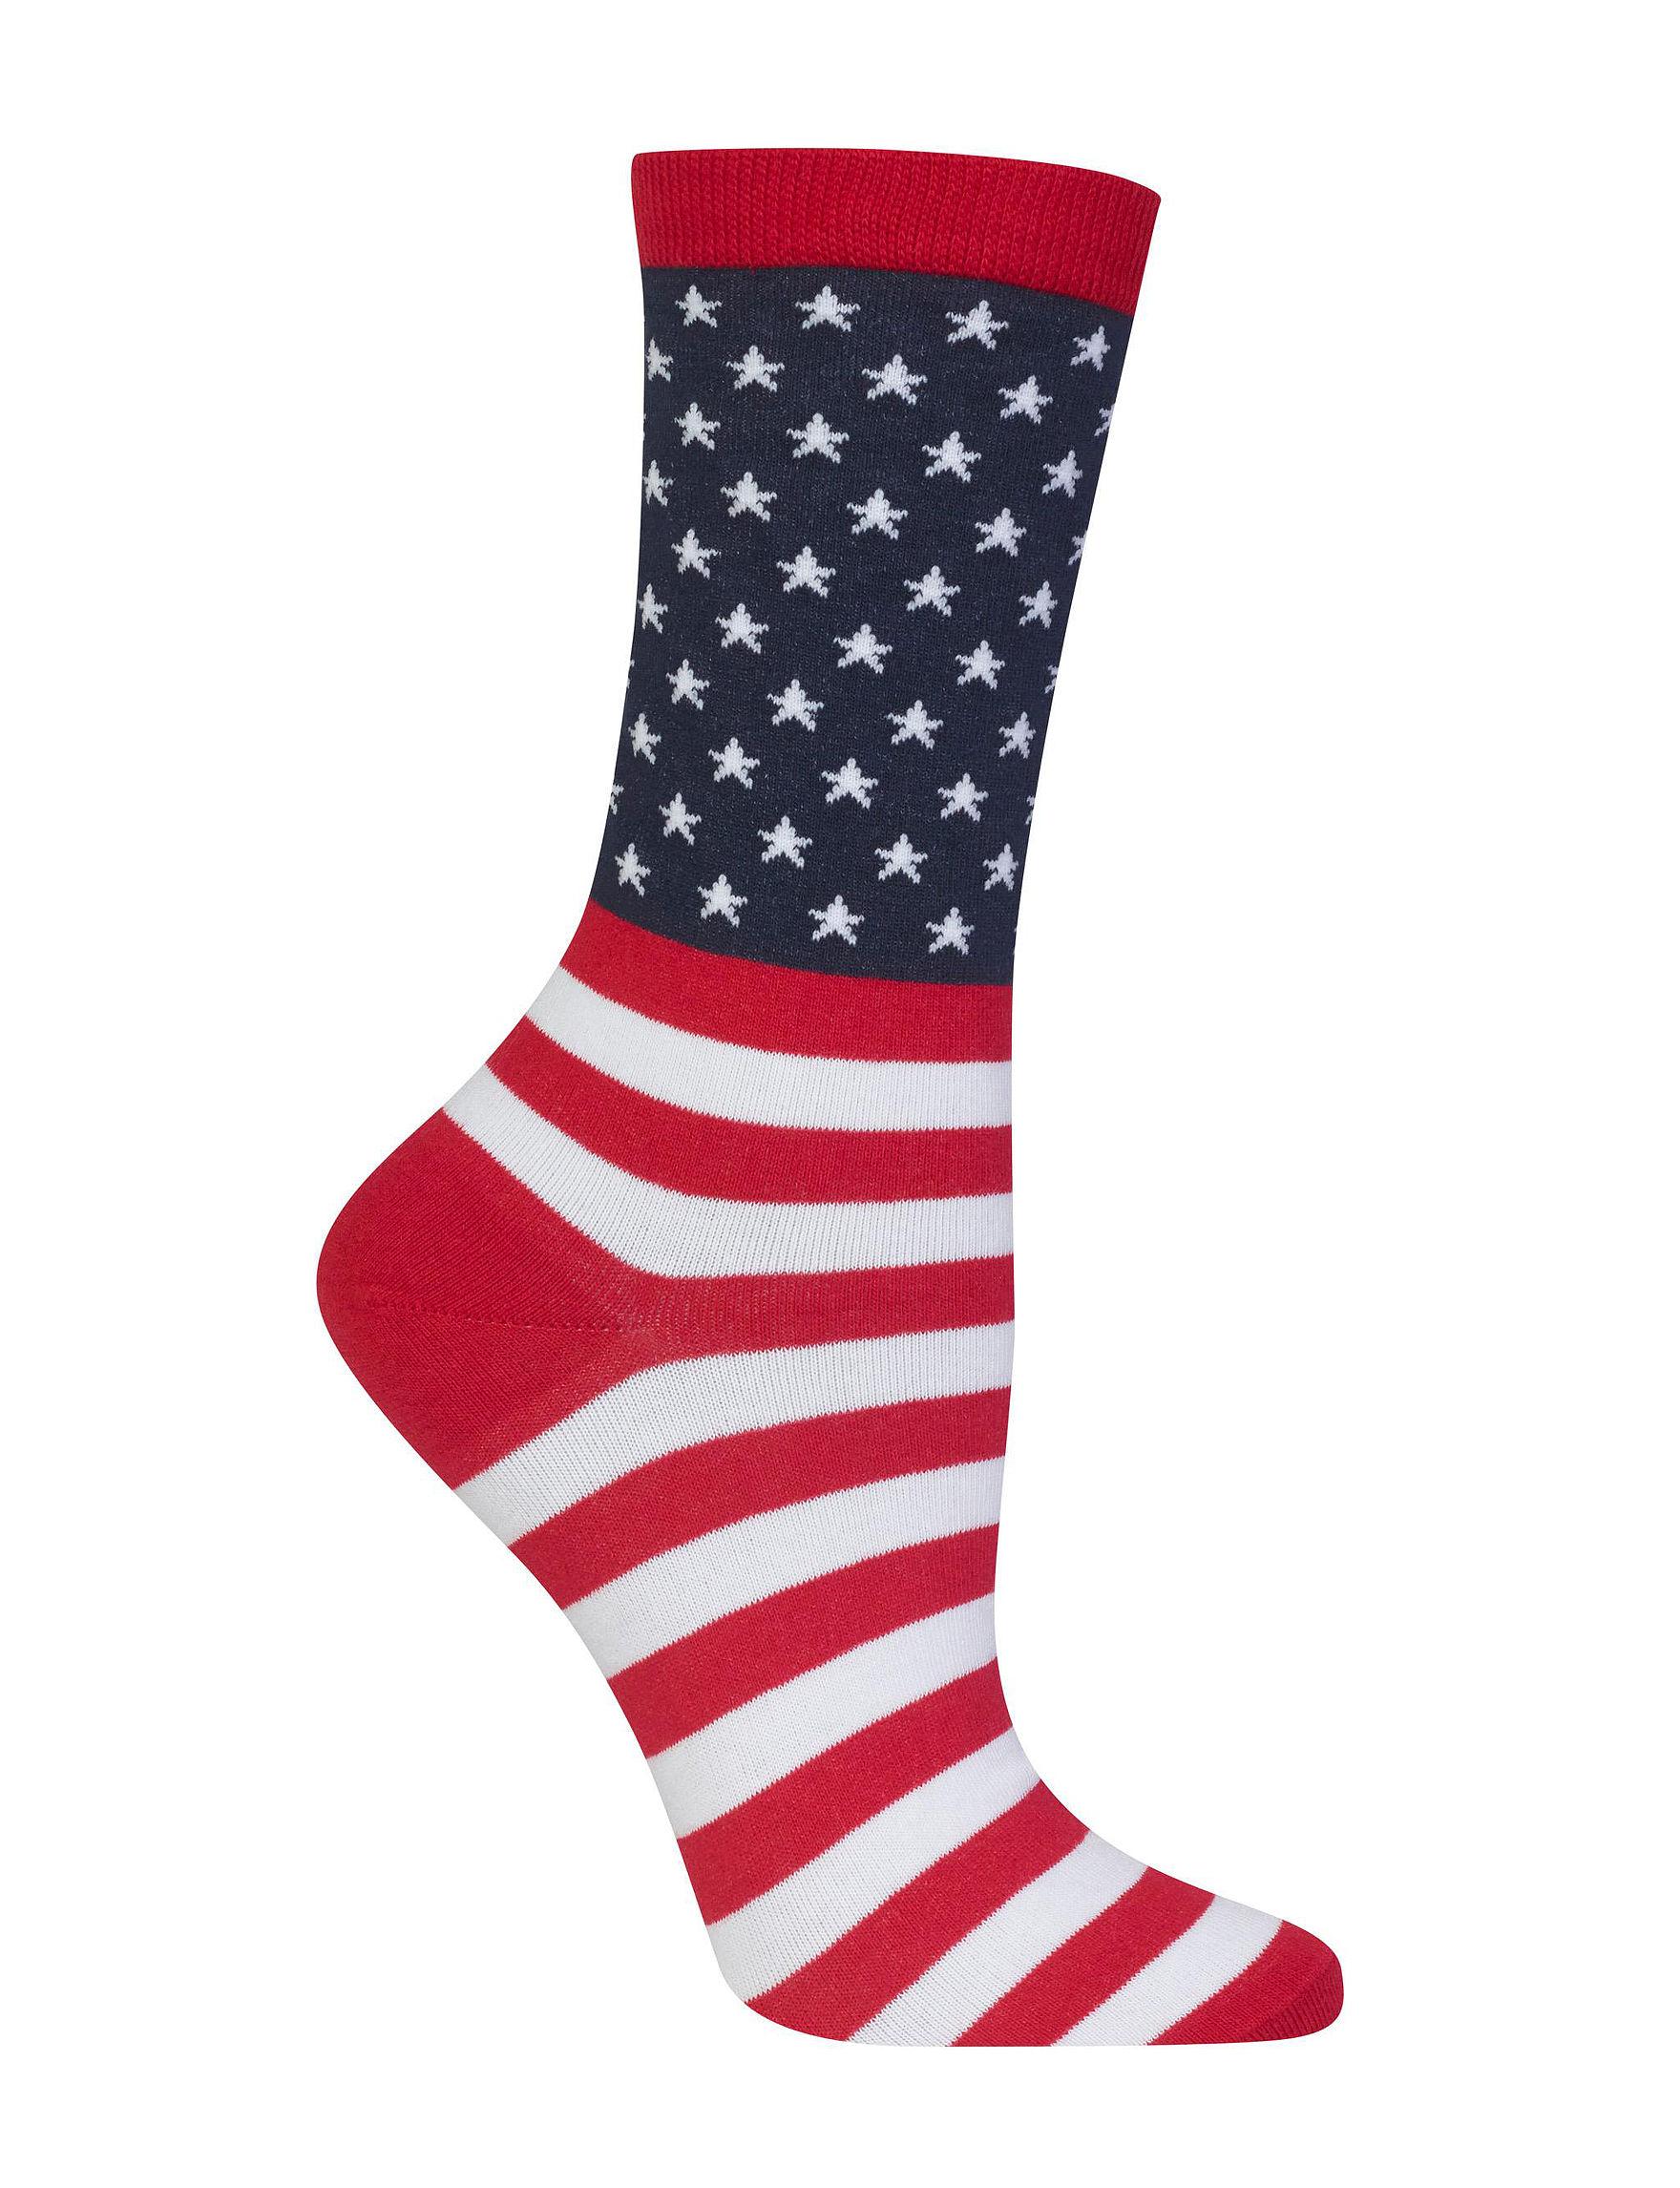 Hot Sox Red Socks